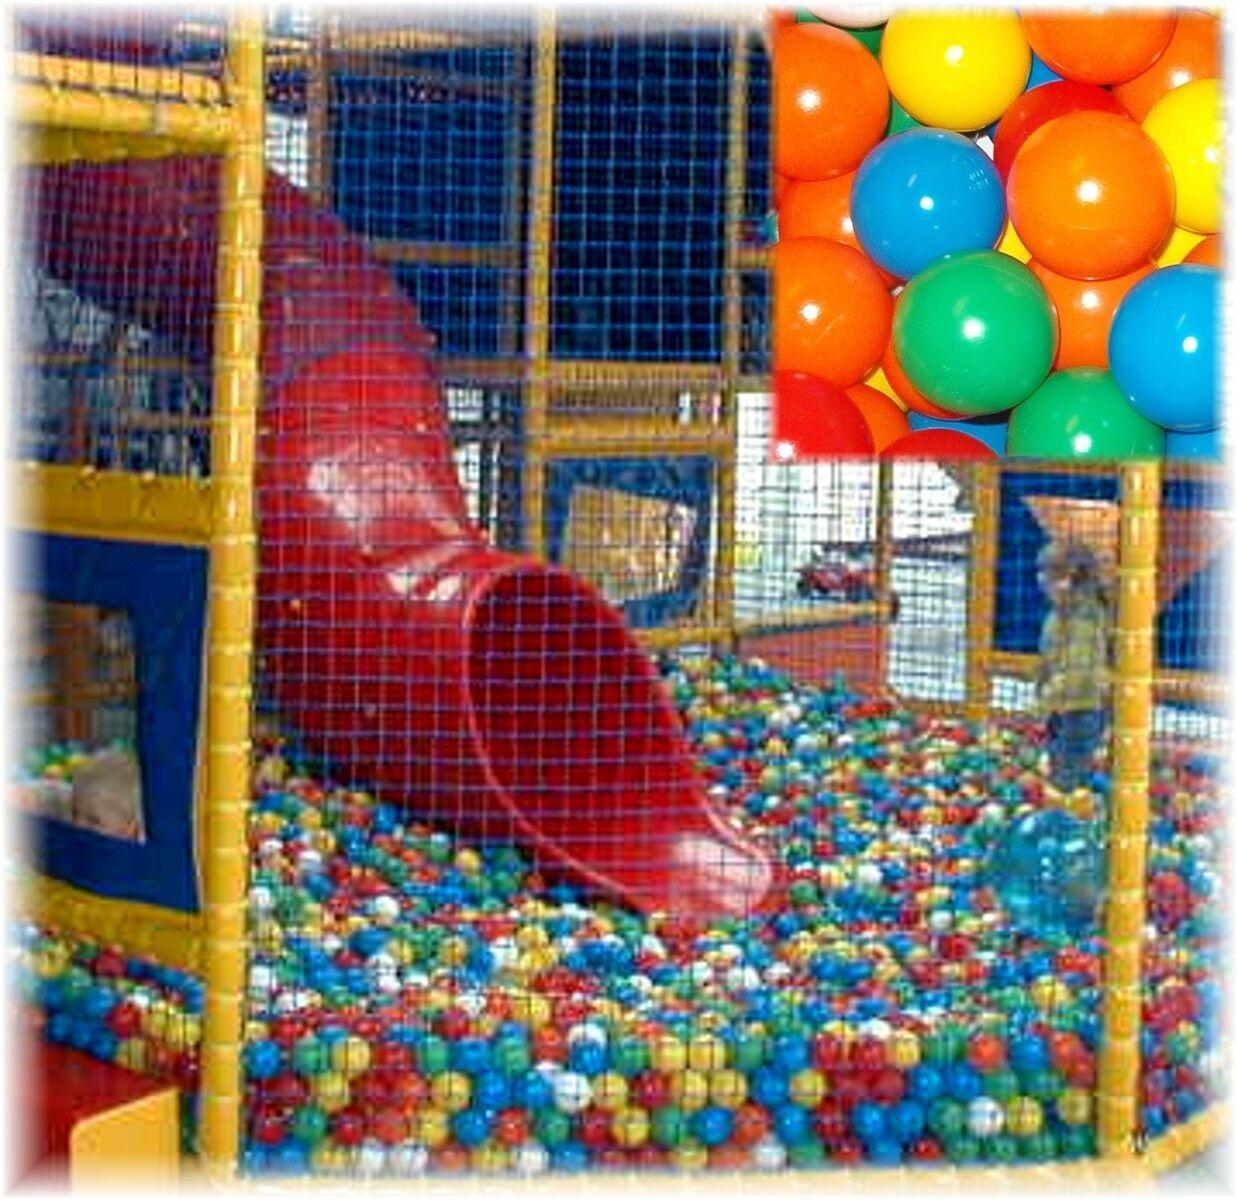 500 Bälle für Bällebad 75 mm mm mm Therapiebälle Spielbälle Euromatic bunt Ballspaß a9d587